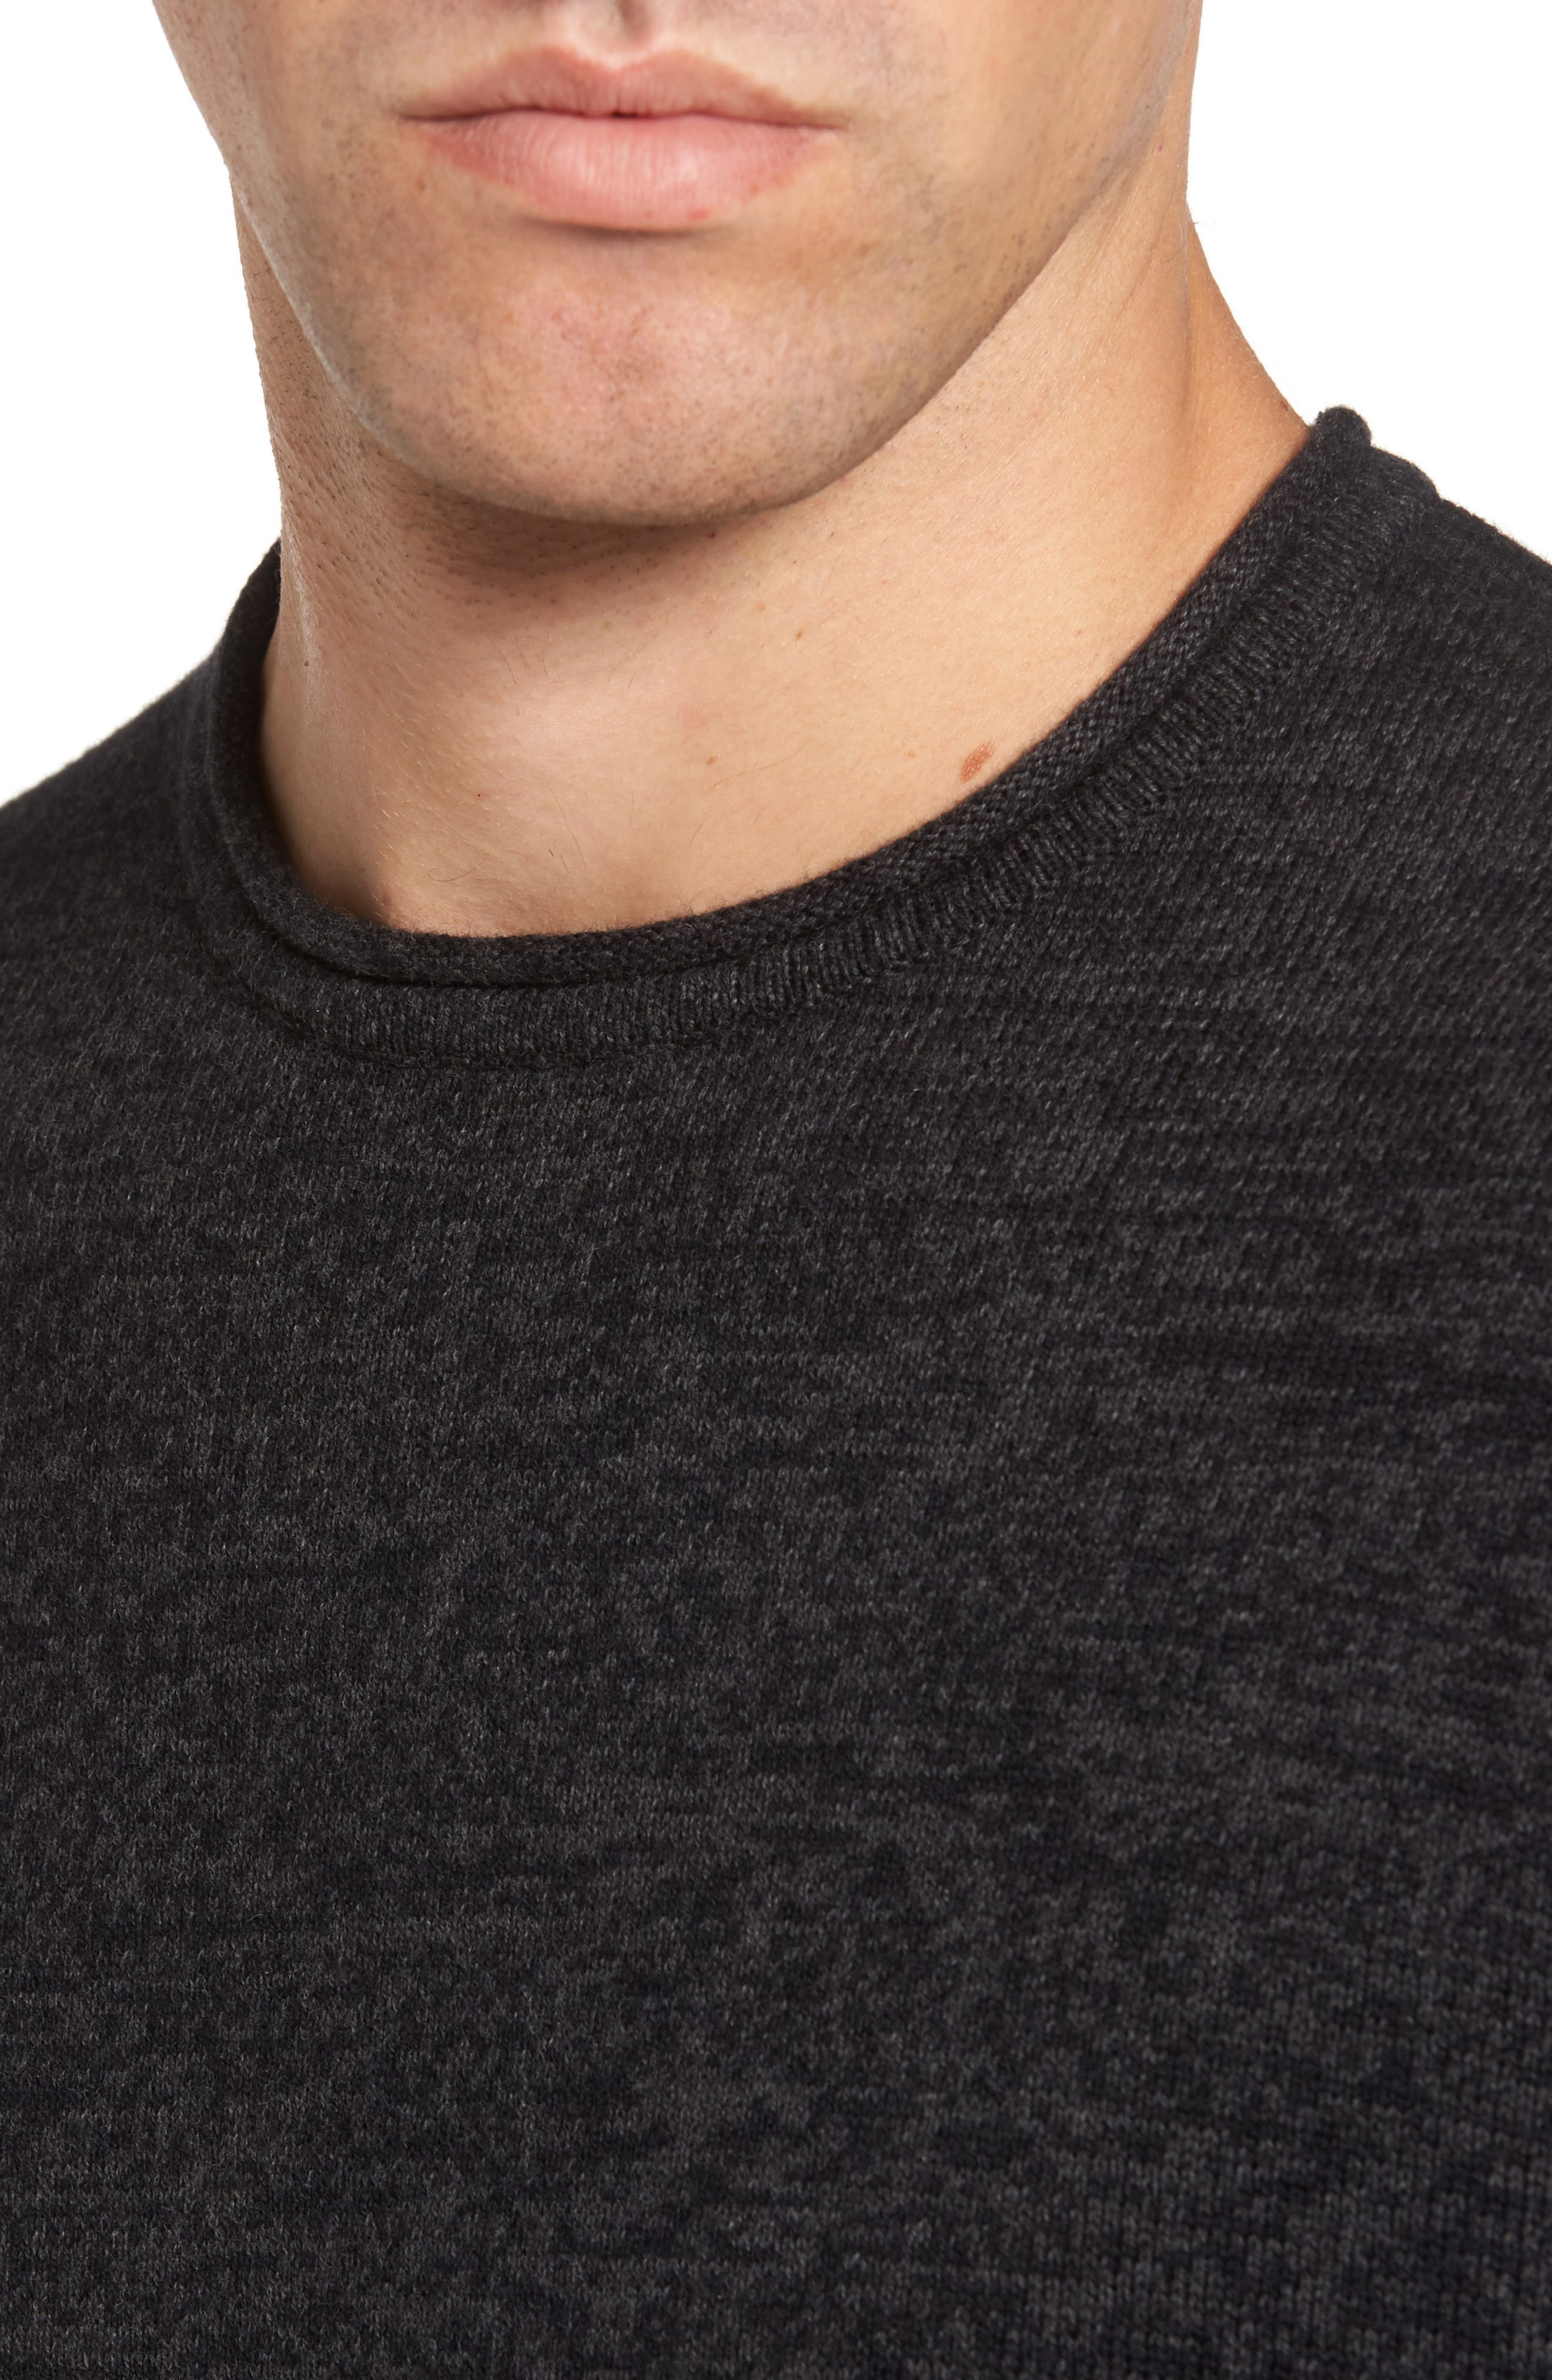 Cotton & Cashmere Roll Neck Sweater,                             Alternate thumbnail 4, color,                             021